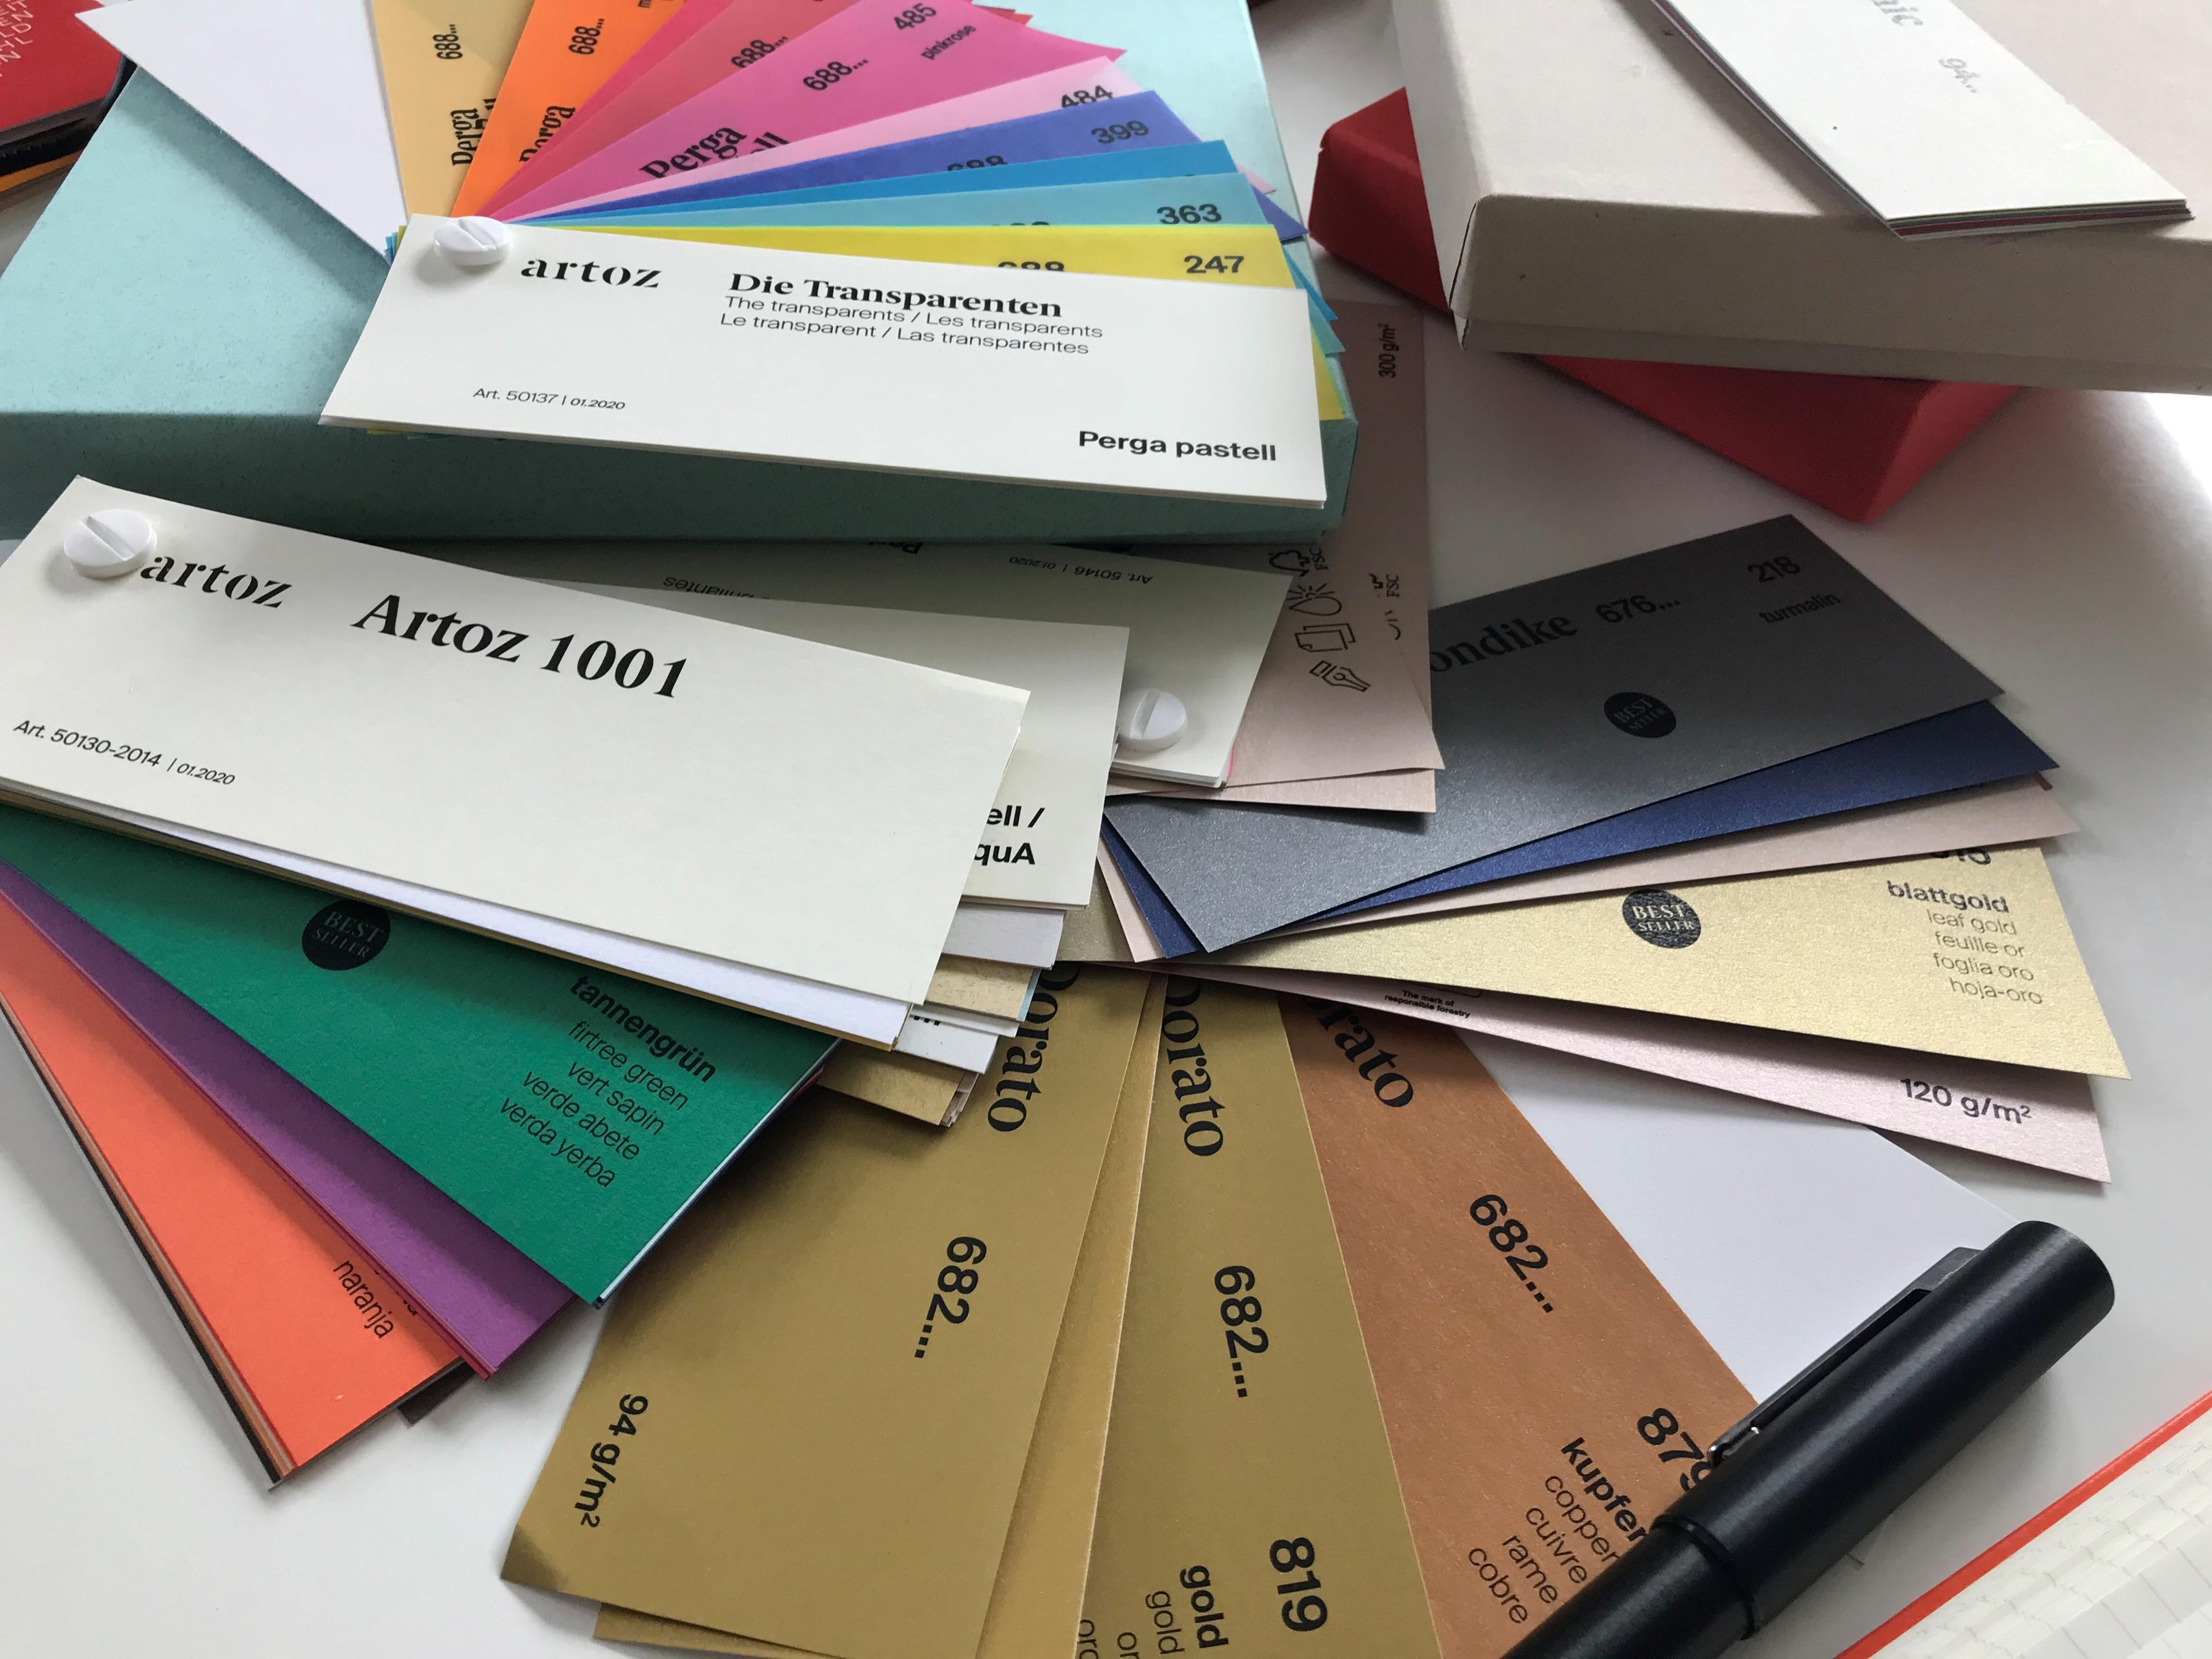 artoz_Farbf-cher_papiere-in-allen-Farben_grusskarten-designDCMUzGWt97TBc